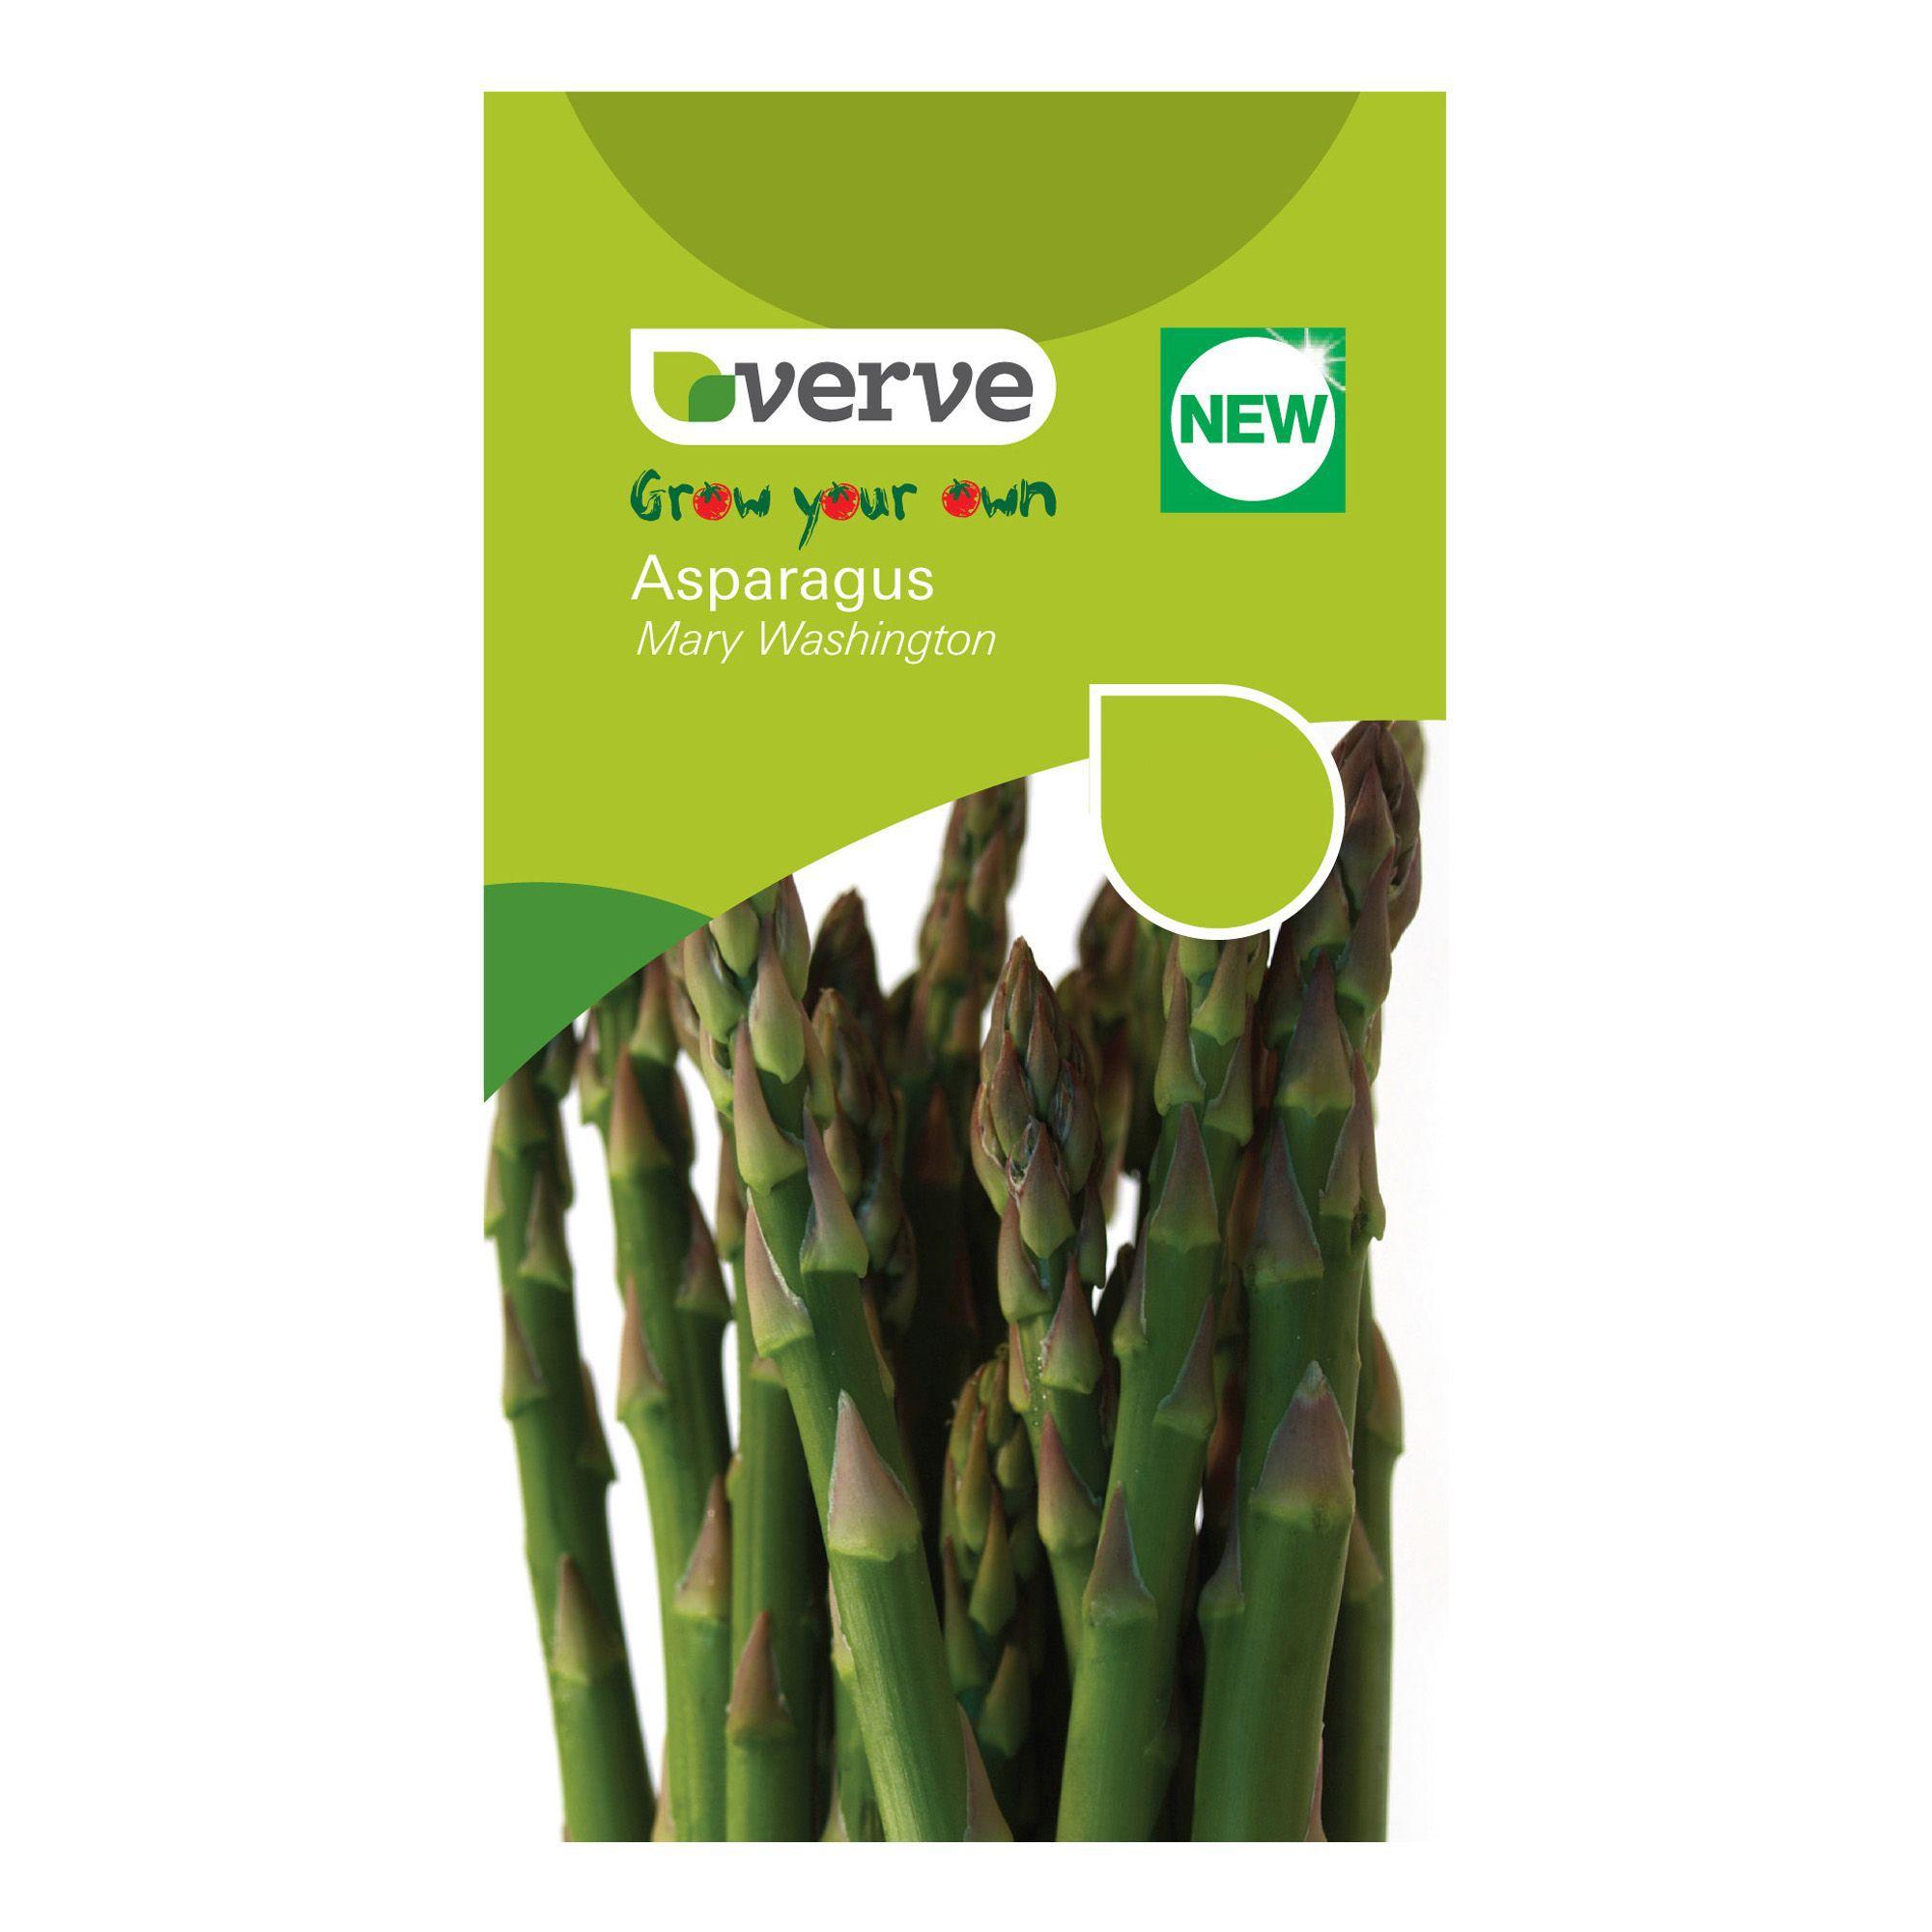 Verve Asparagus Pea Seeds Mary Washington Mix  : 0416391602c from www.diy.com size 2000 x 2000 jpeg 173kB